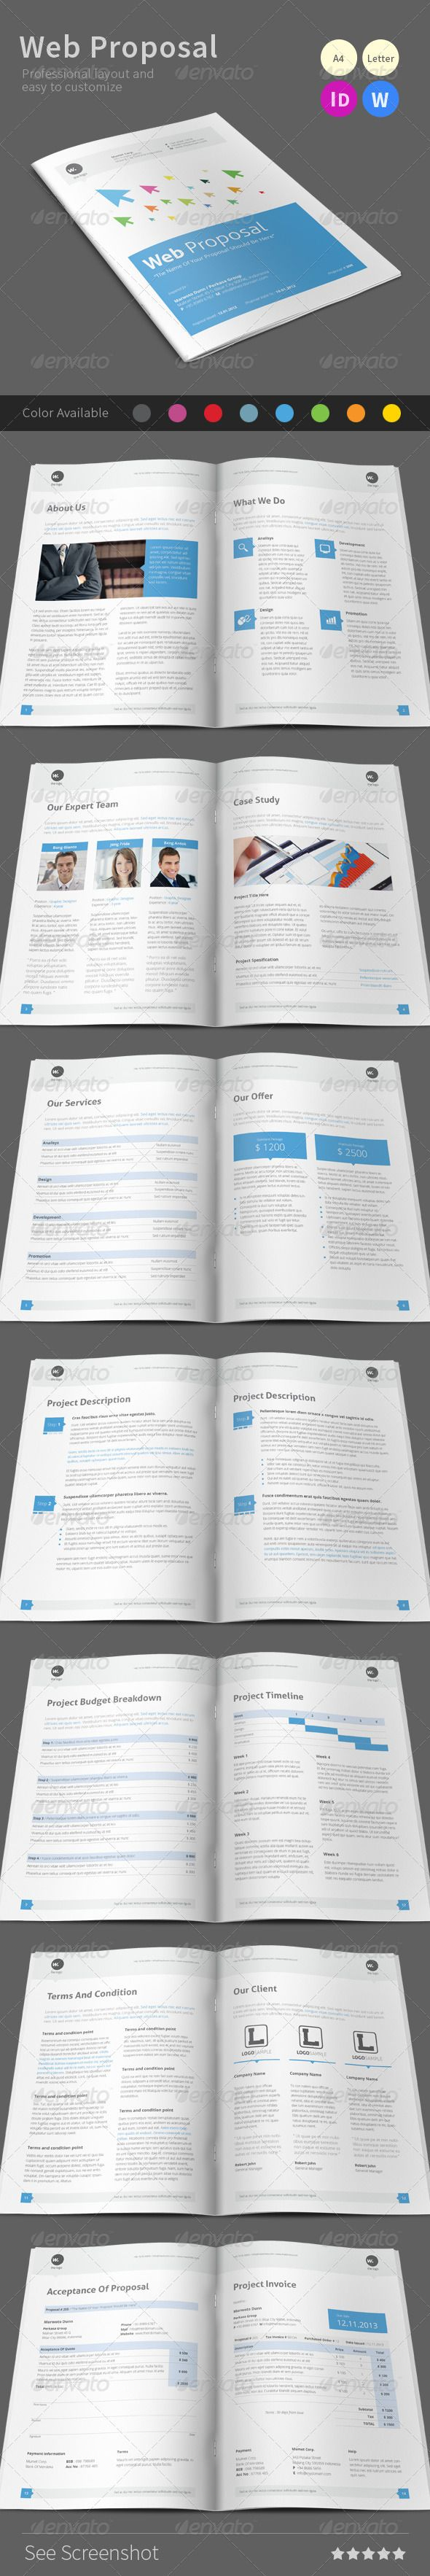 Web Proposal Web Proposal Proposals Business